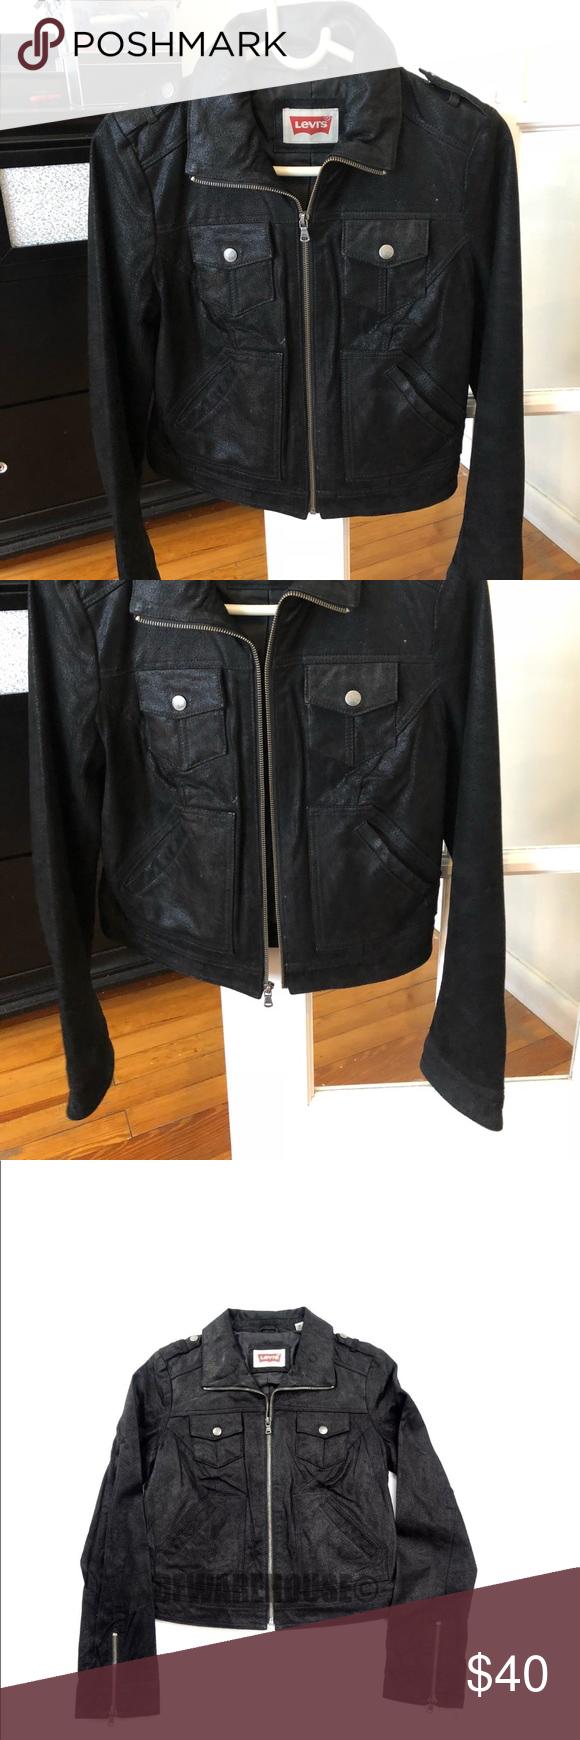 Levi's Women's leather jacket LEVI'S Womens Motorcycle